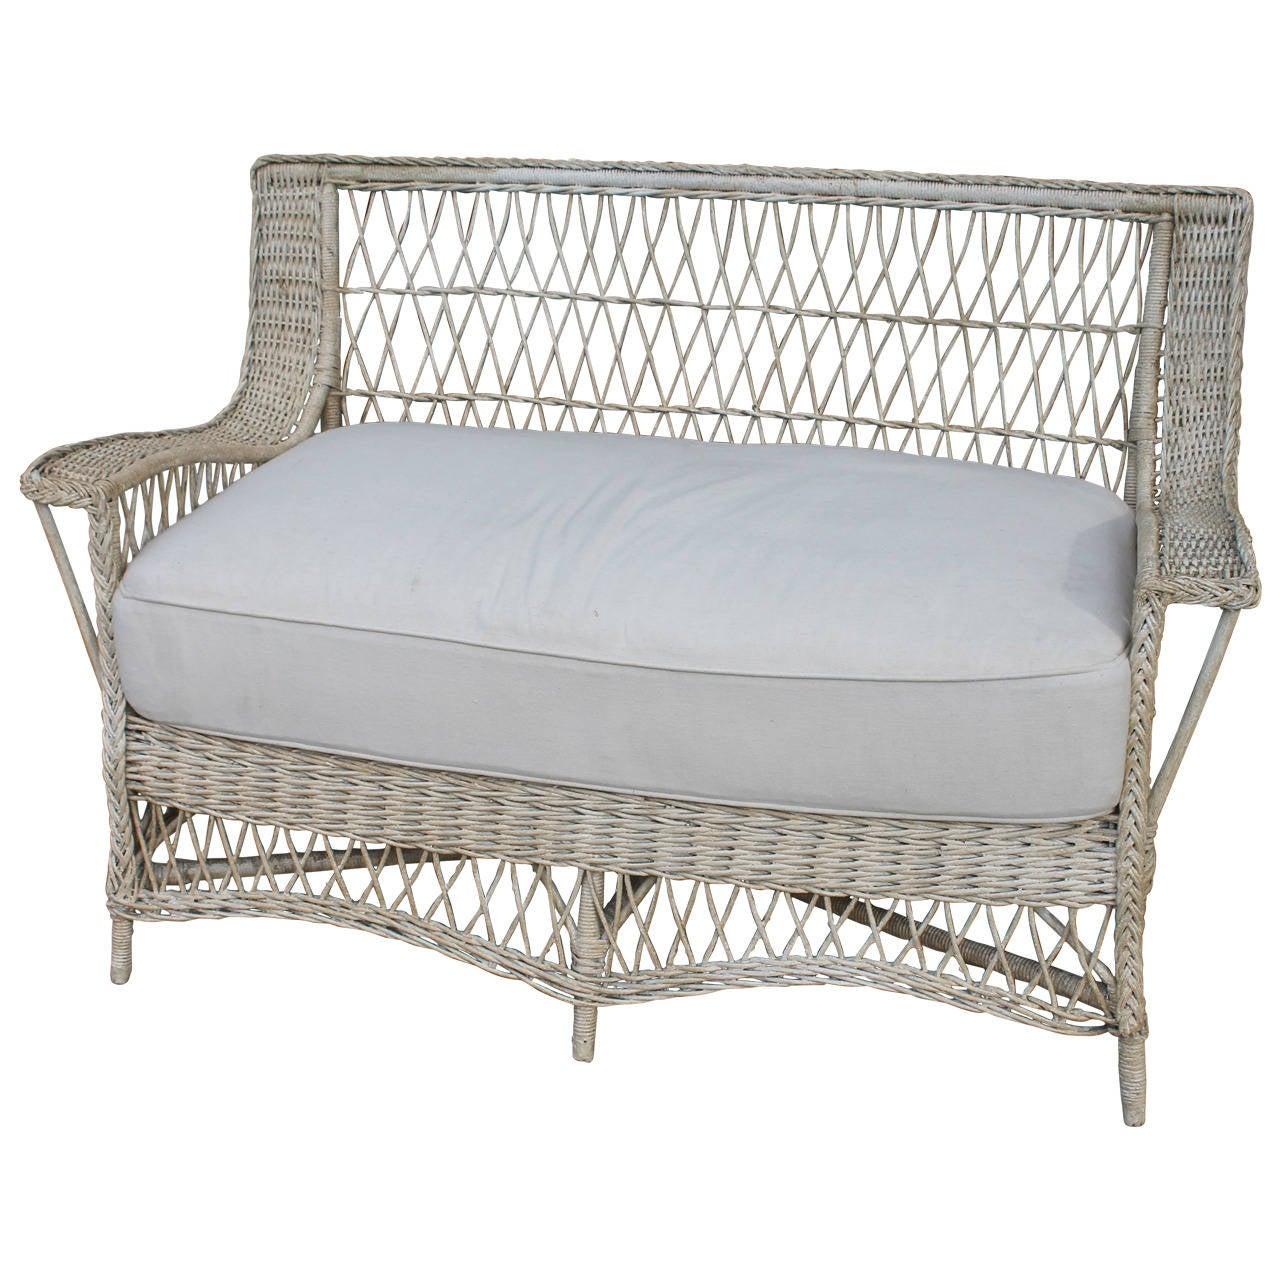 1930 cane back sofa sofas etc reviews 1930s original cream painted heywood wakefield wicker